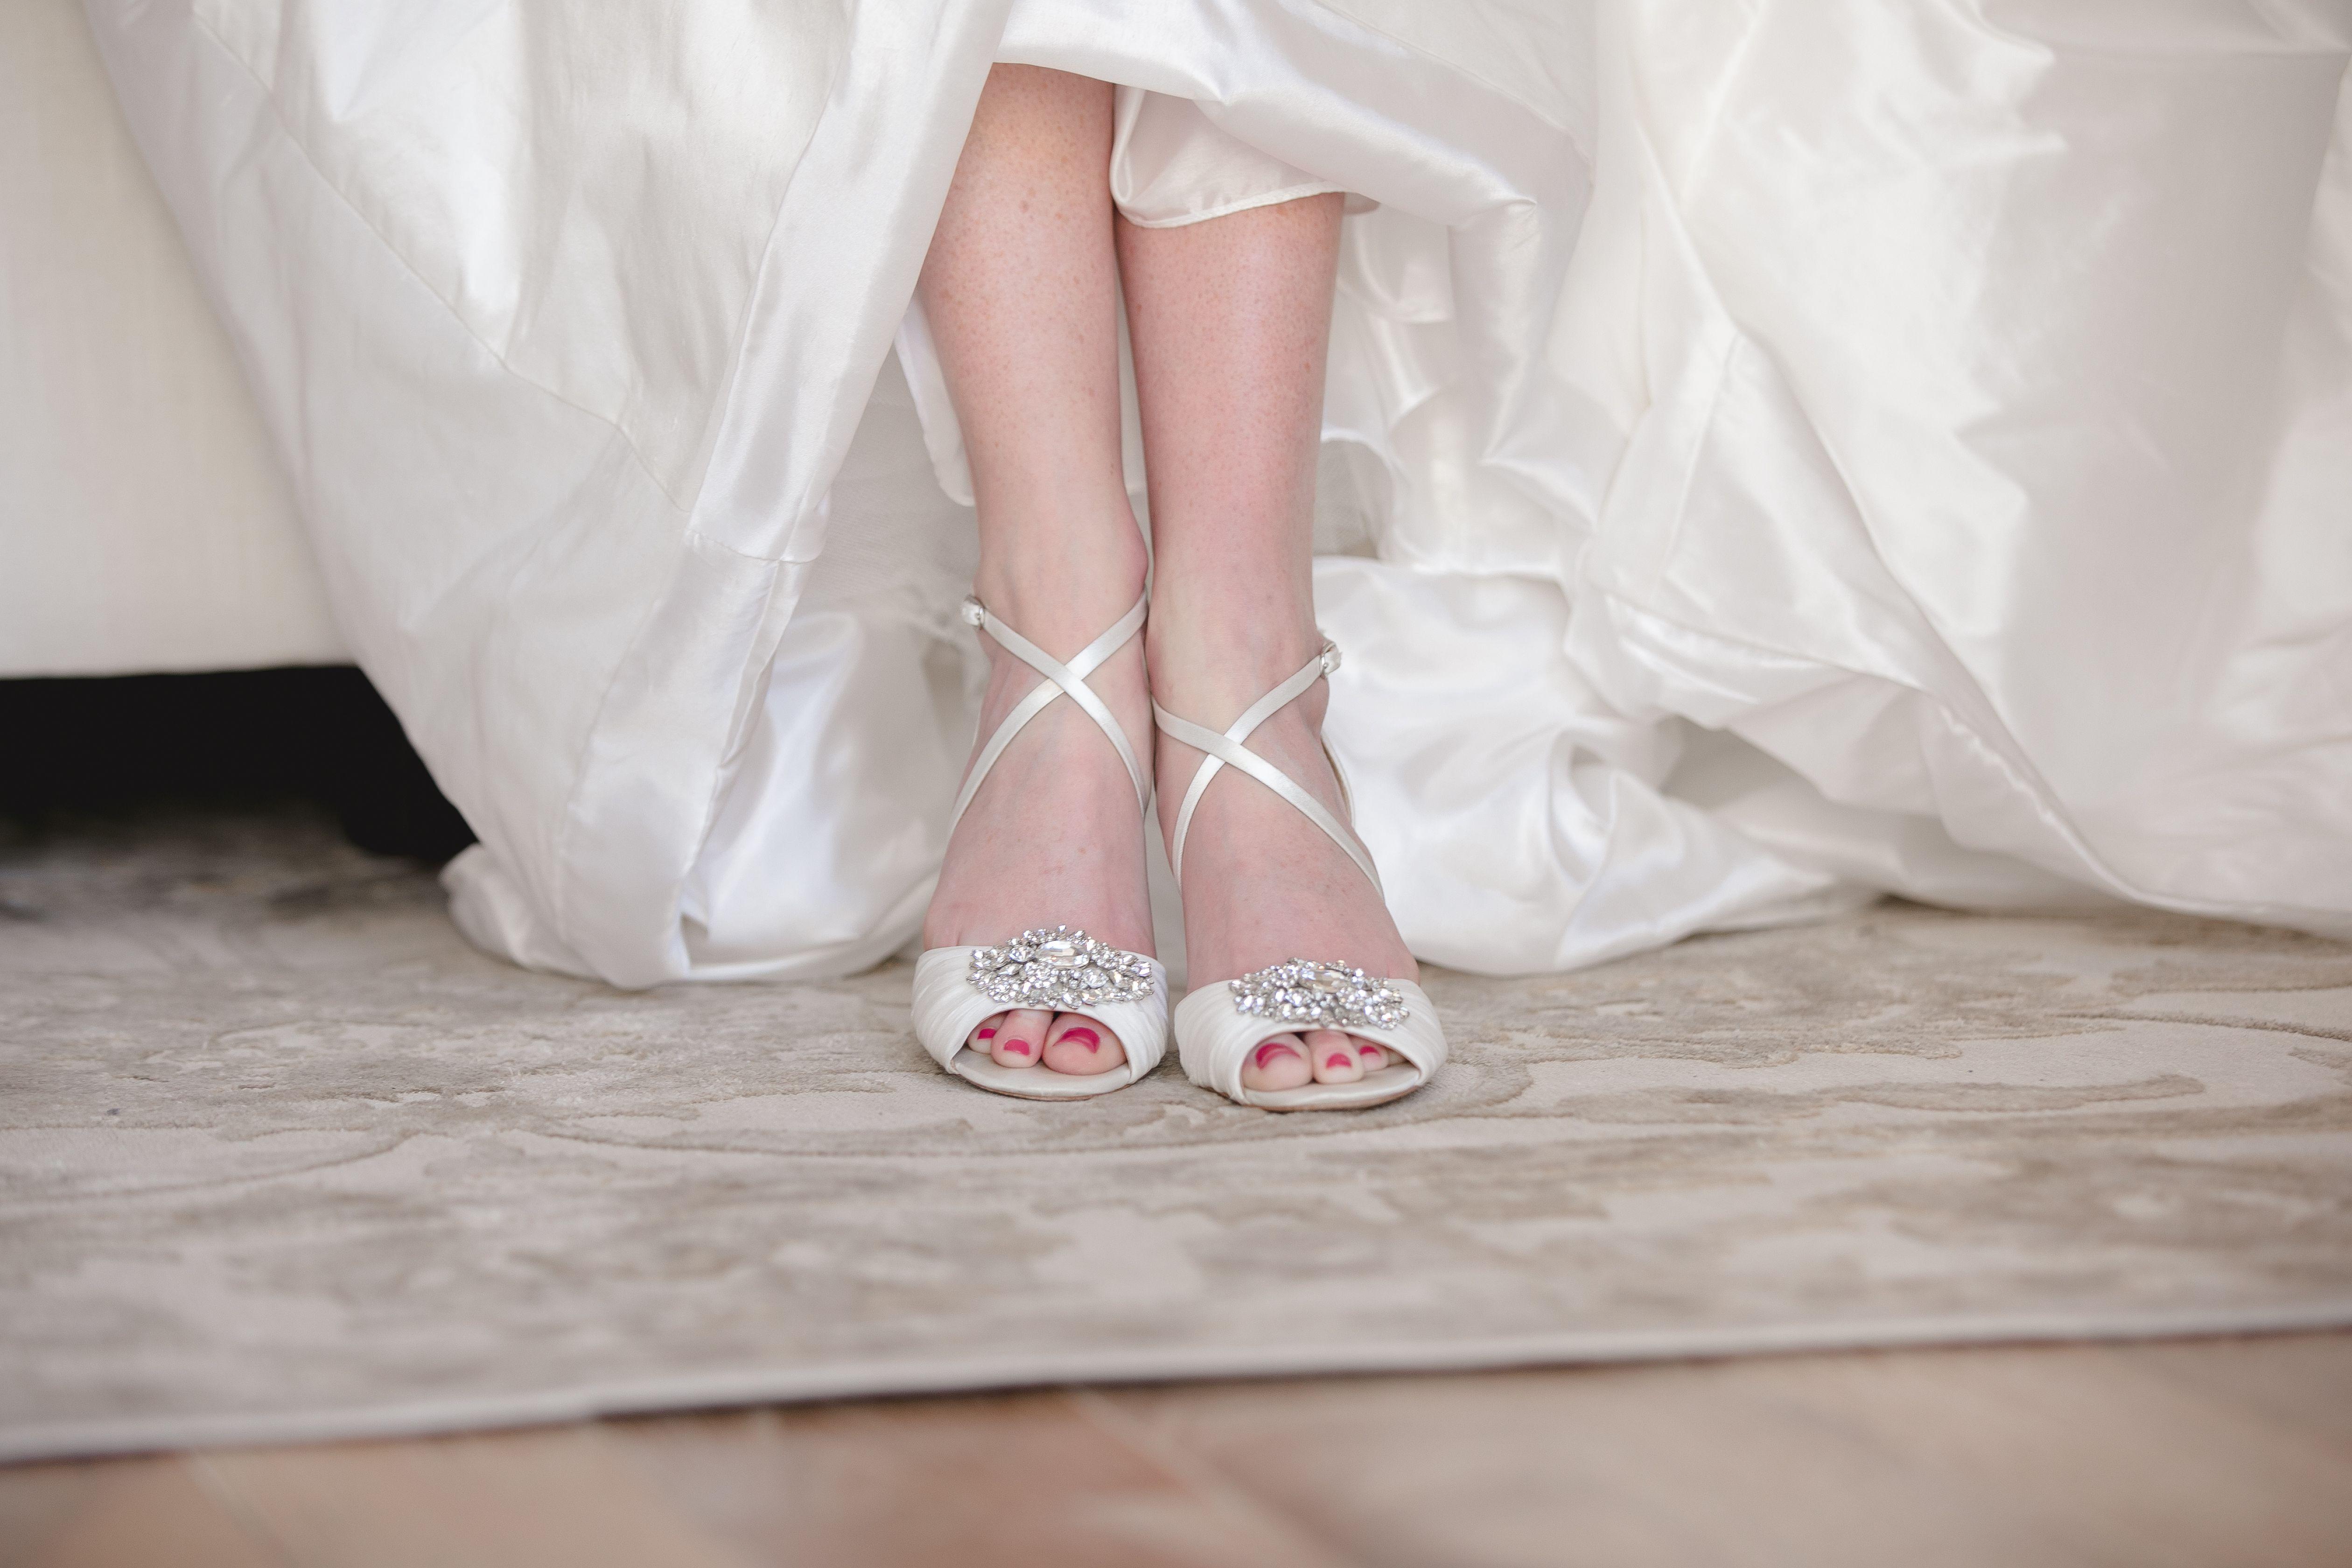 Wedding Day Shoes Bridal Shoes Wedding Dress Ideas Wedding Day